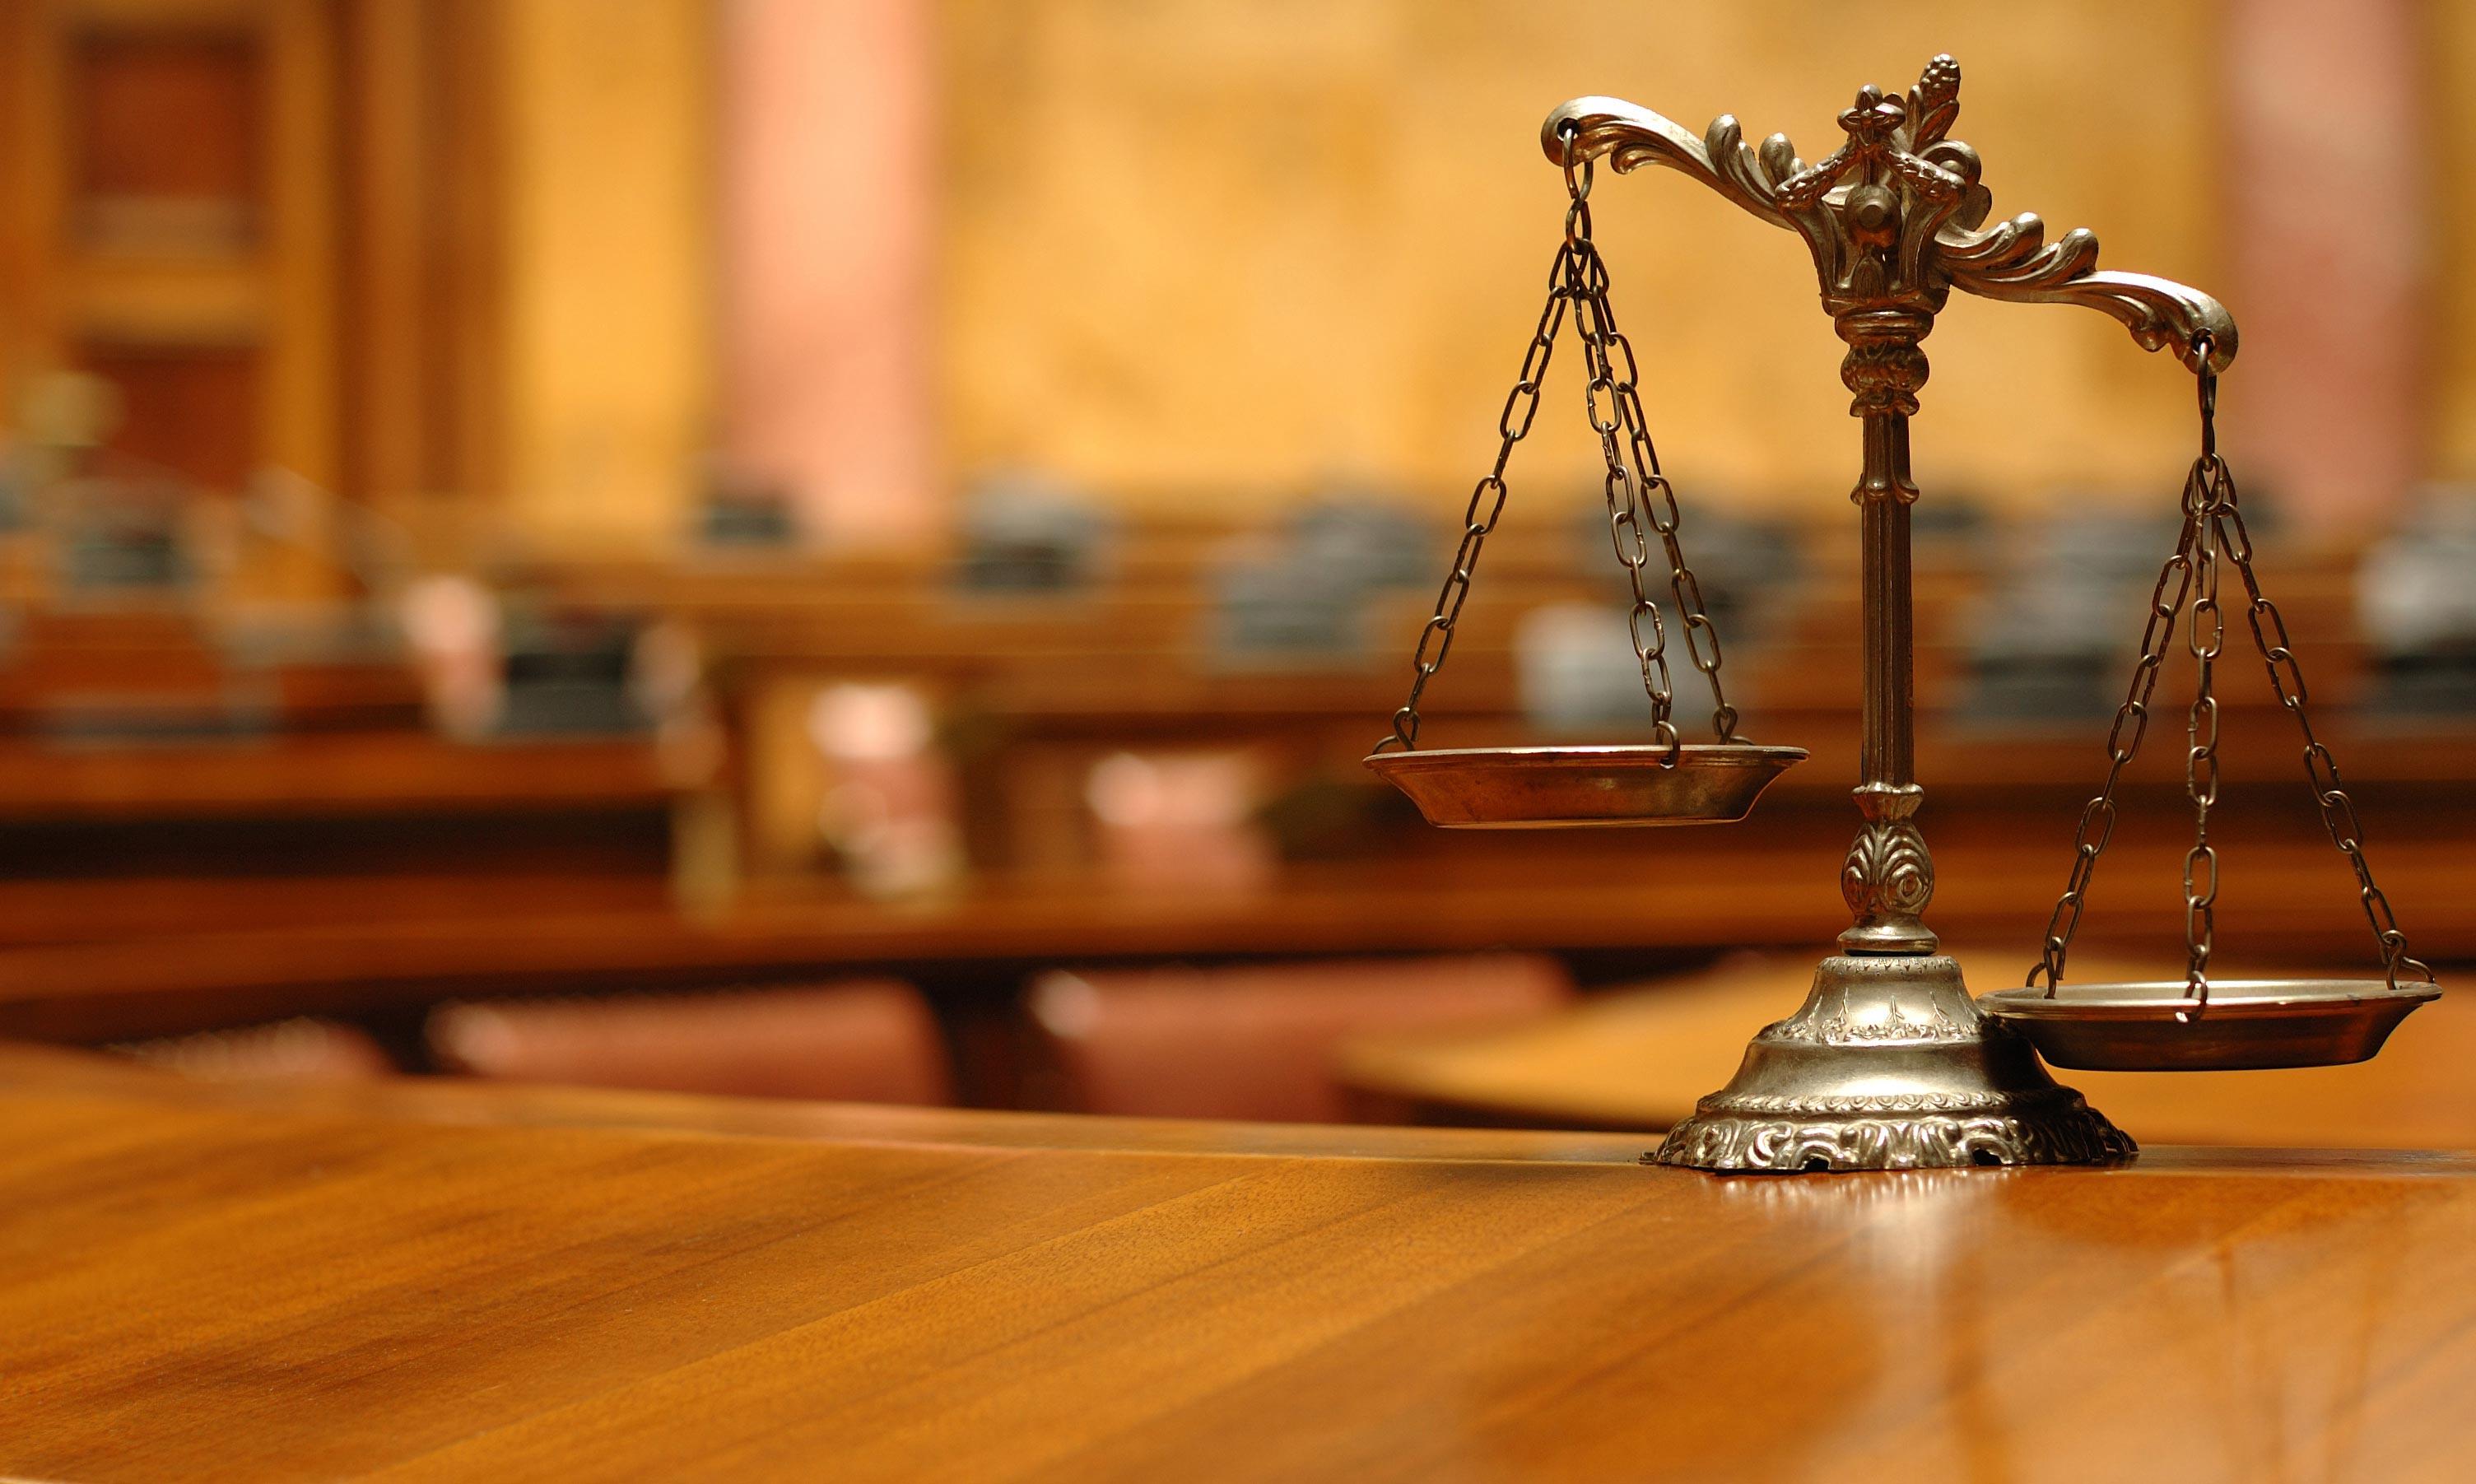 وکیل متخصص کرمان - مشاوره حقوقی کرمان - وکیل بندرعباس